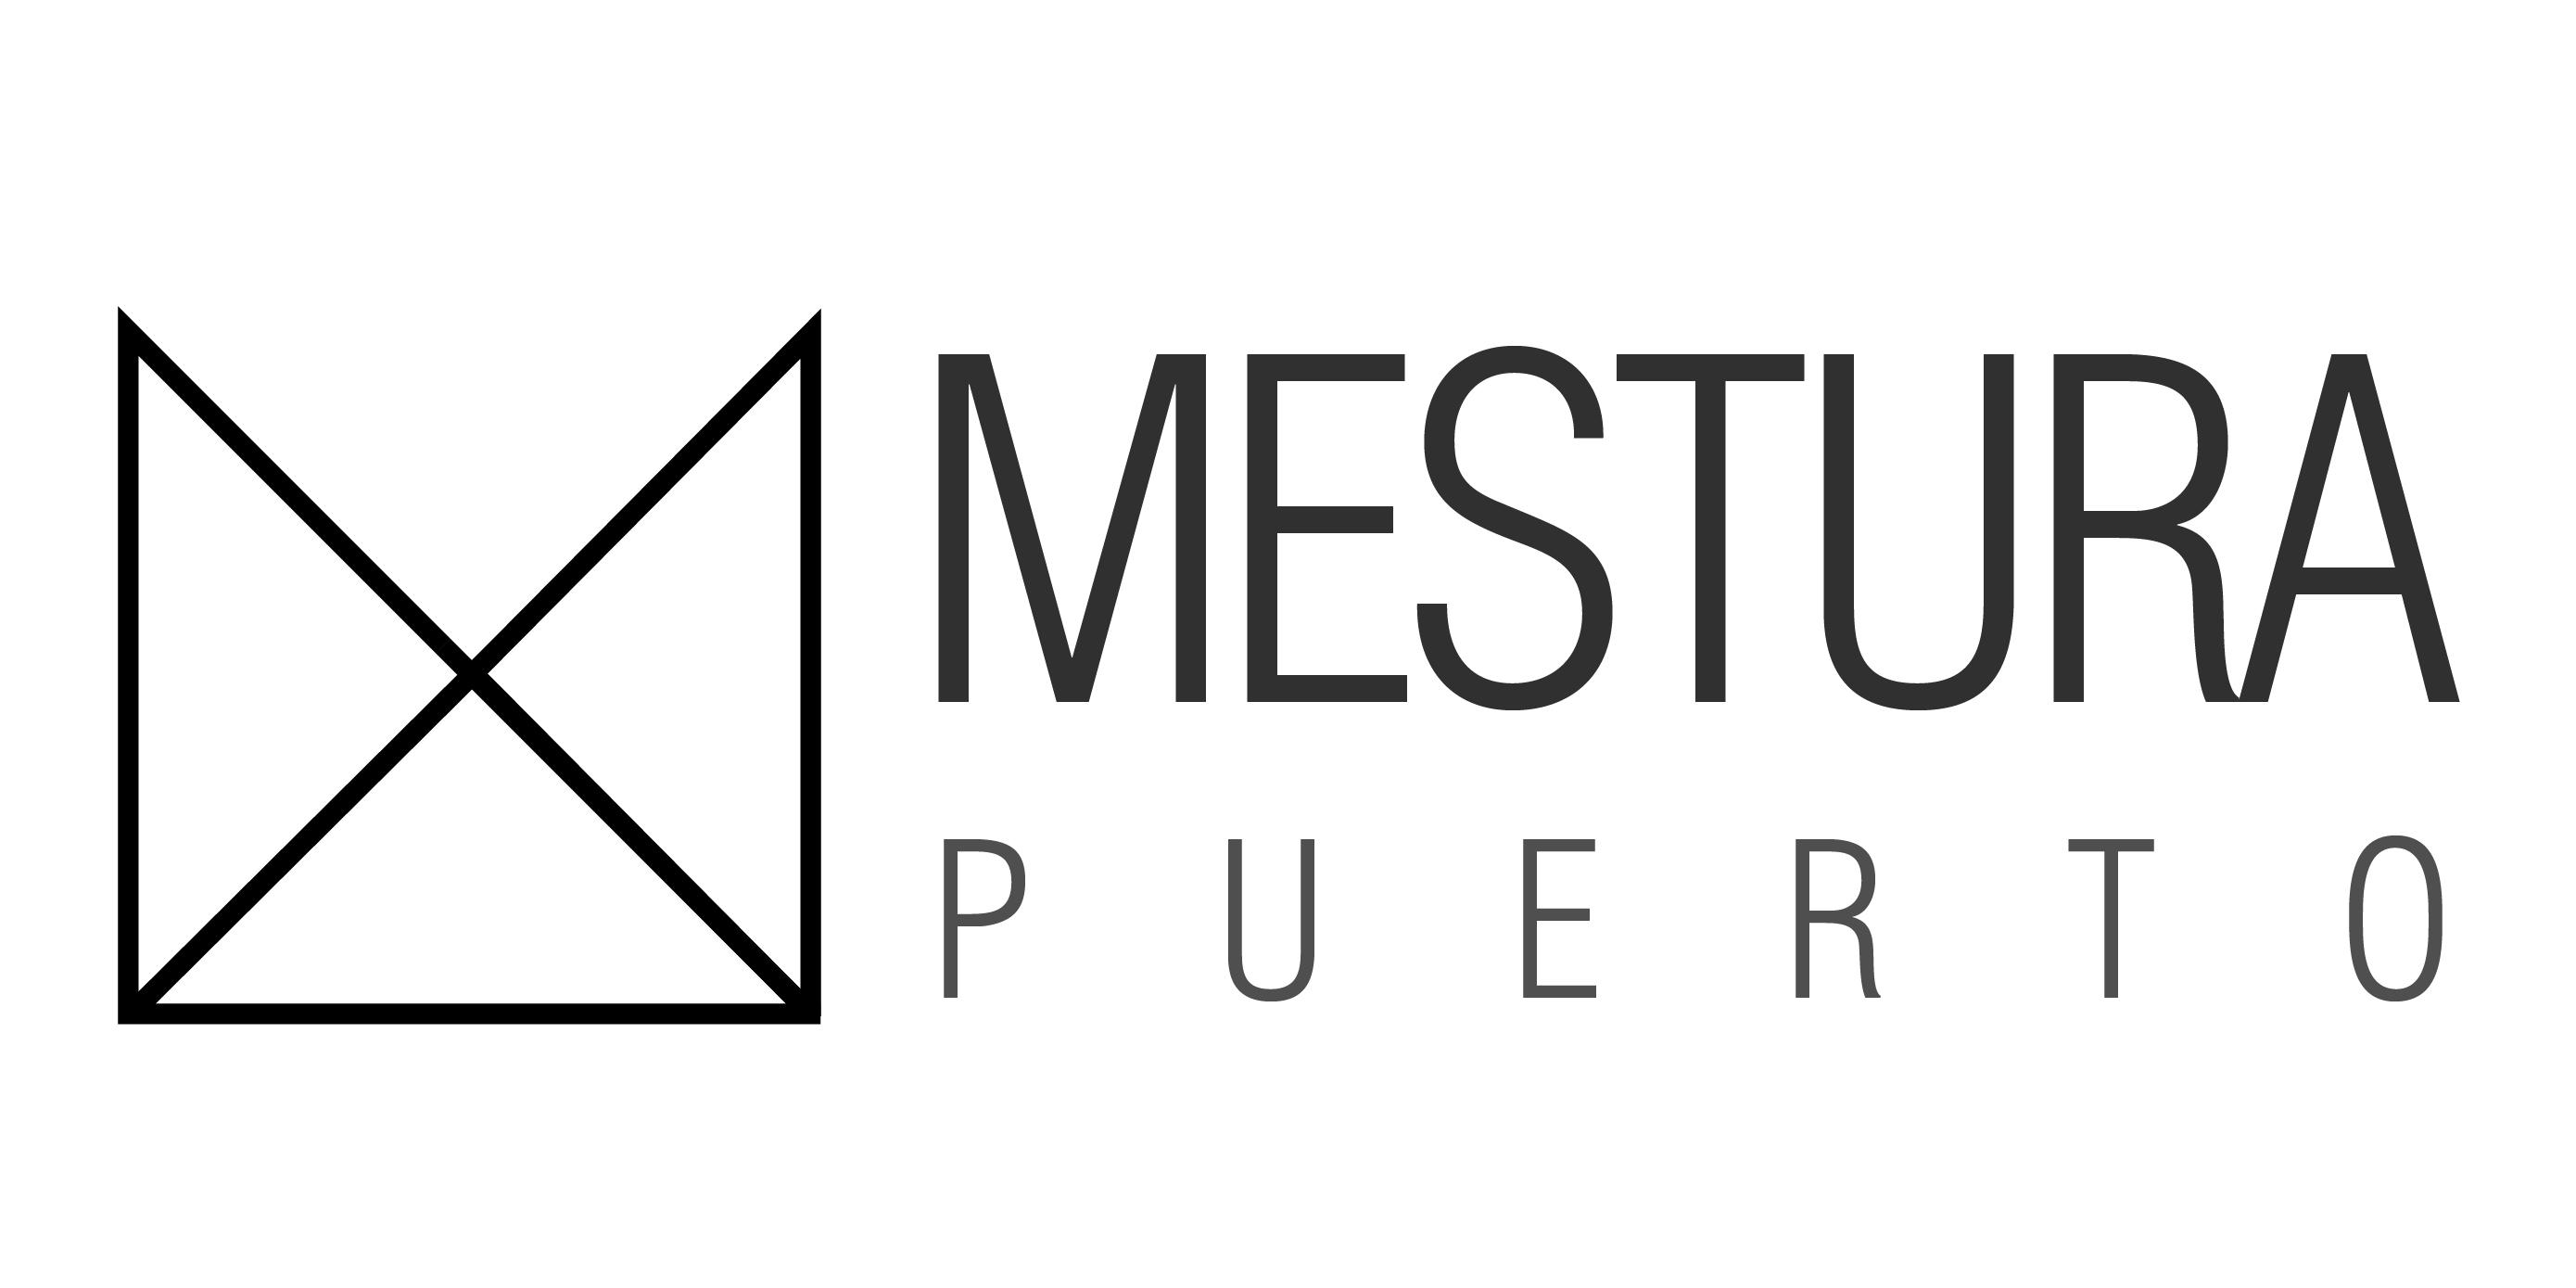 logotipo-familias/172108_Mestura-17.jpg